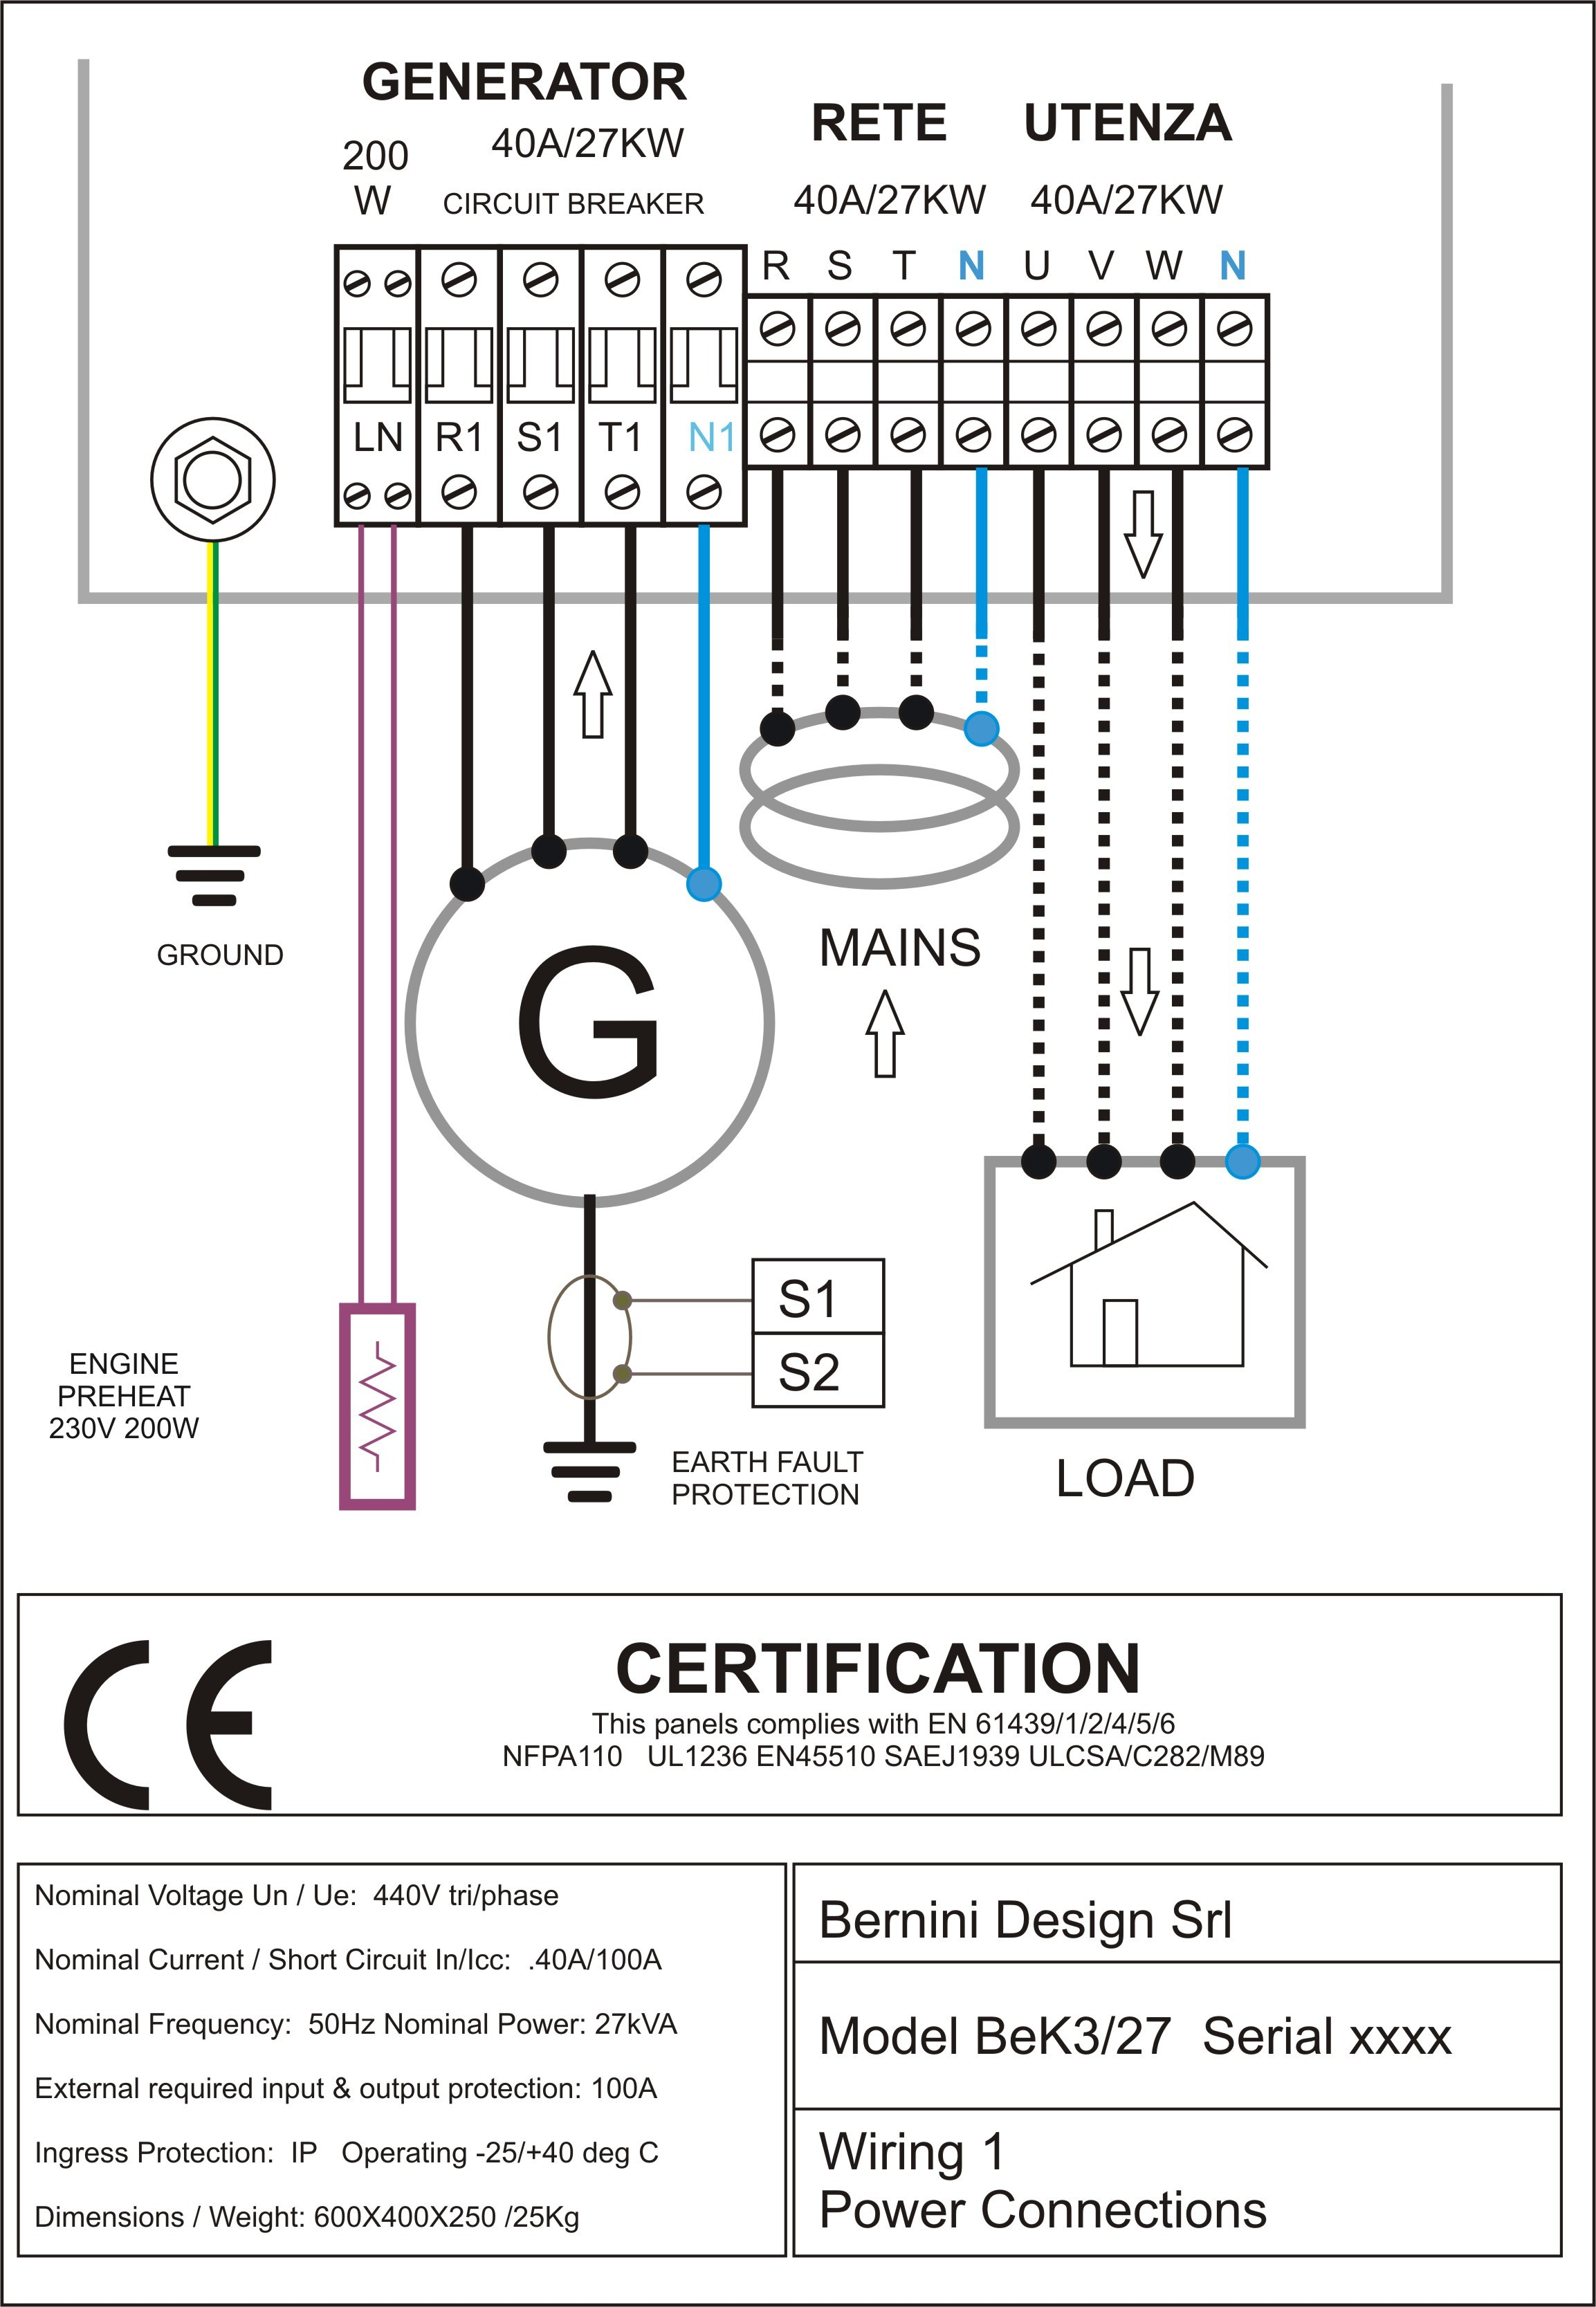 Control Diagram Elegant Sel Generator Control Panel Wiring Diagram Ac Connections